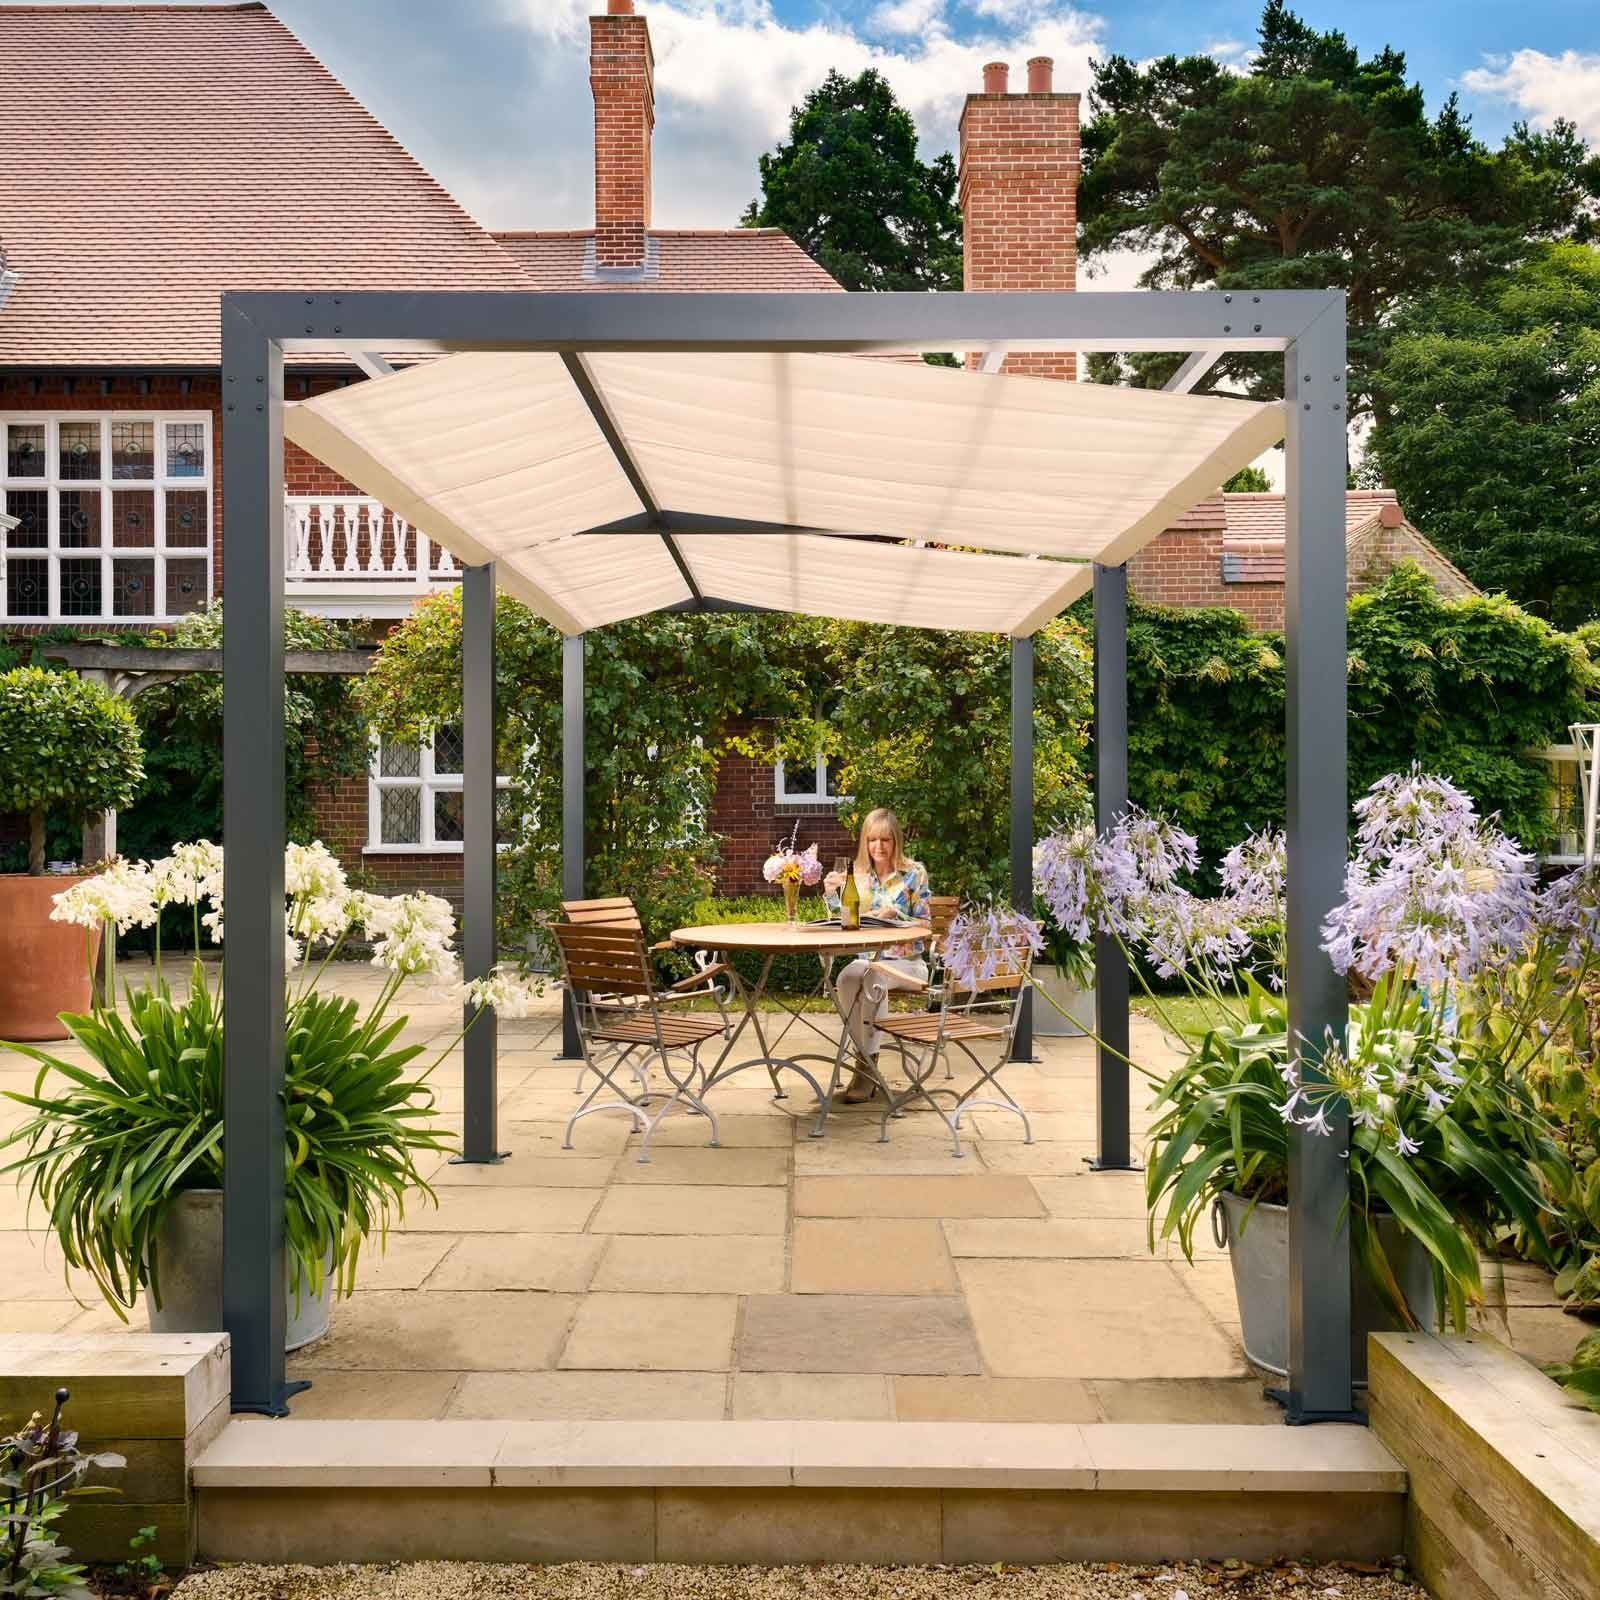 Garden Pergola Designs Uk: Contemporary Arch & Pergola